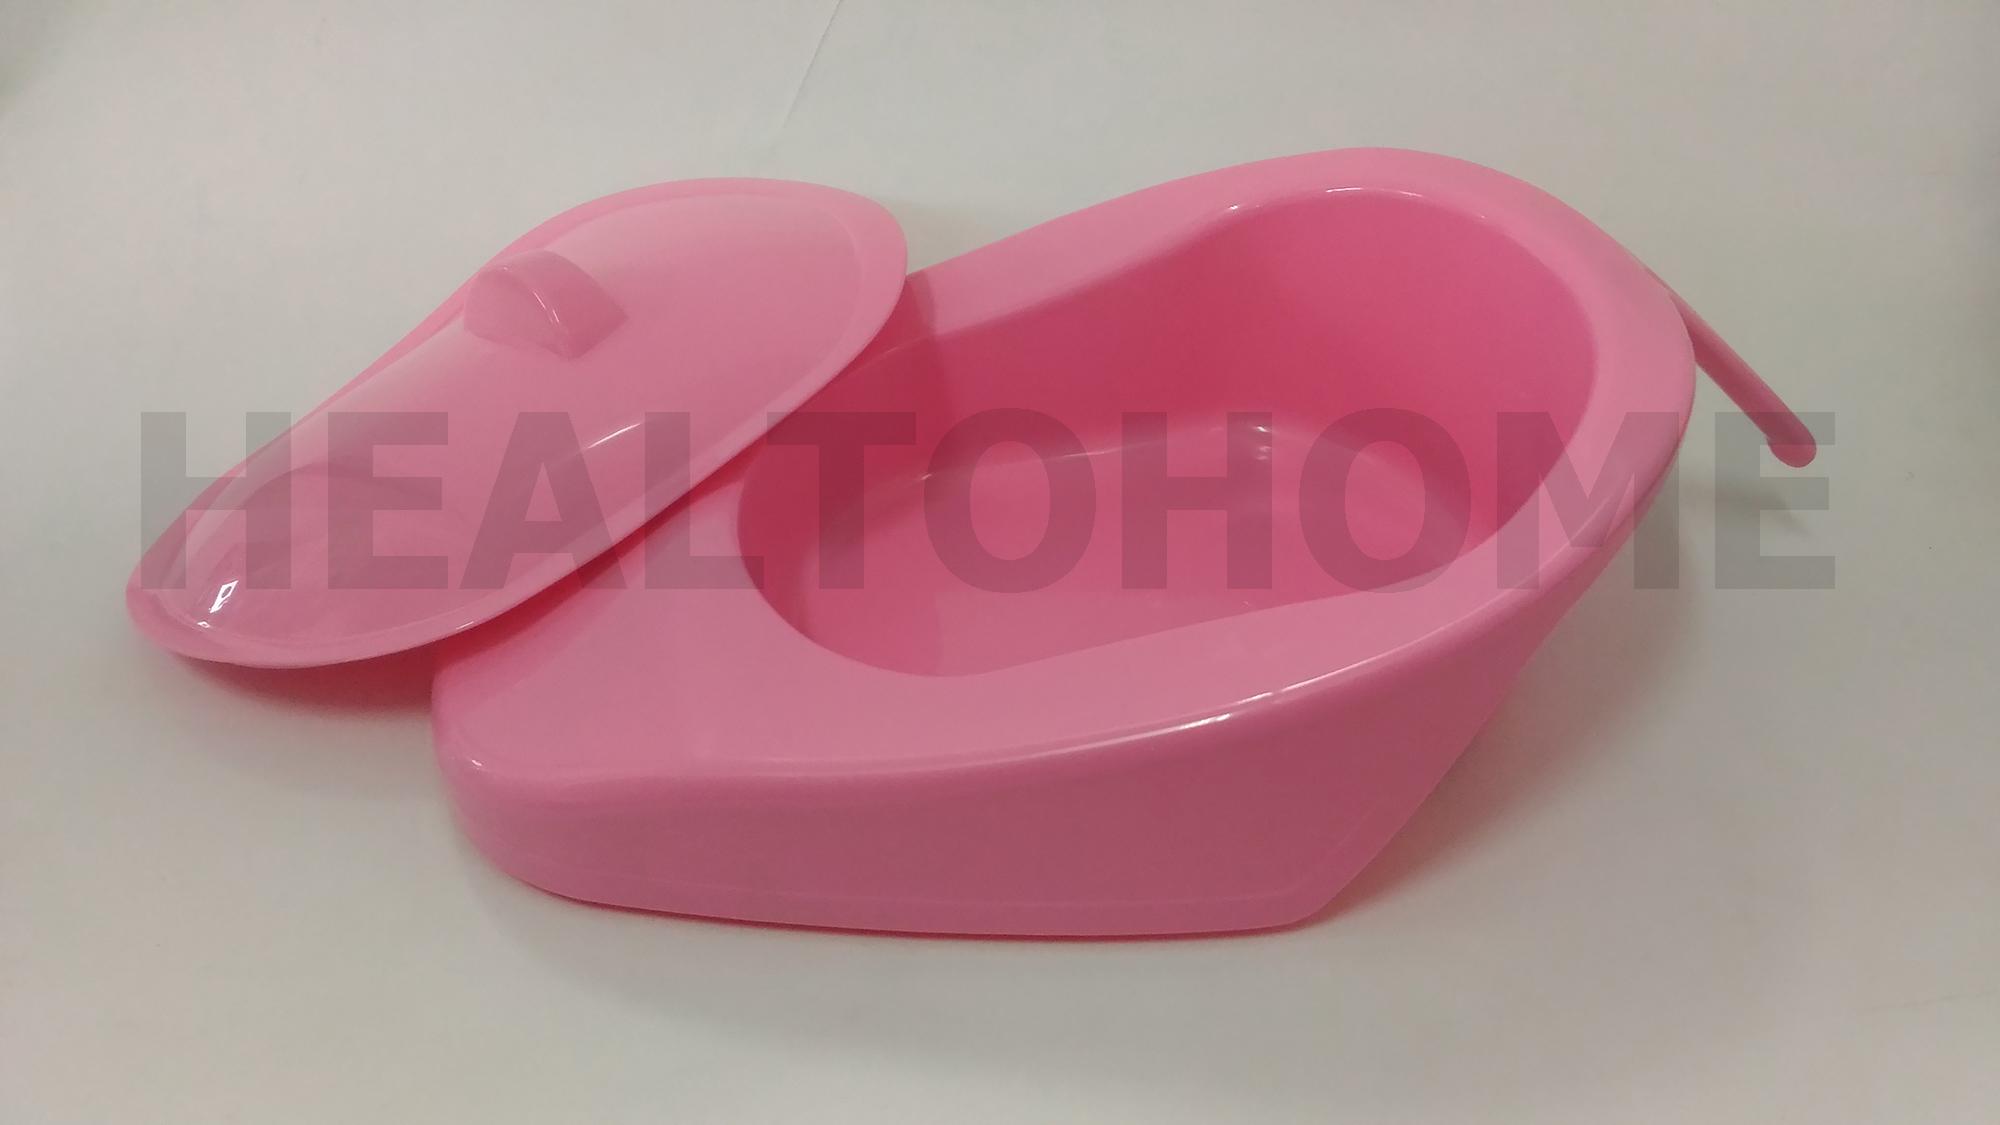 A006 หม้อนอนพลาสติก พร้อมฝาปิด (สีชมพู)